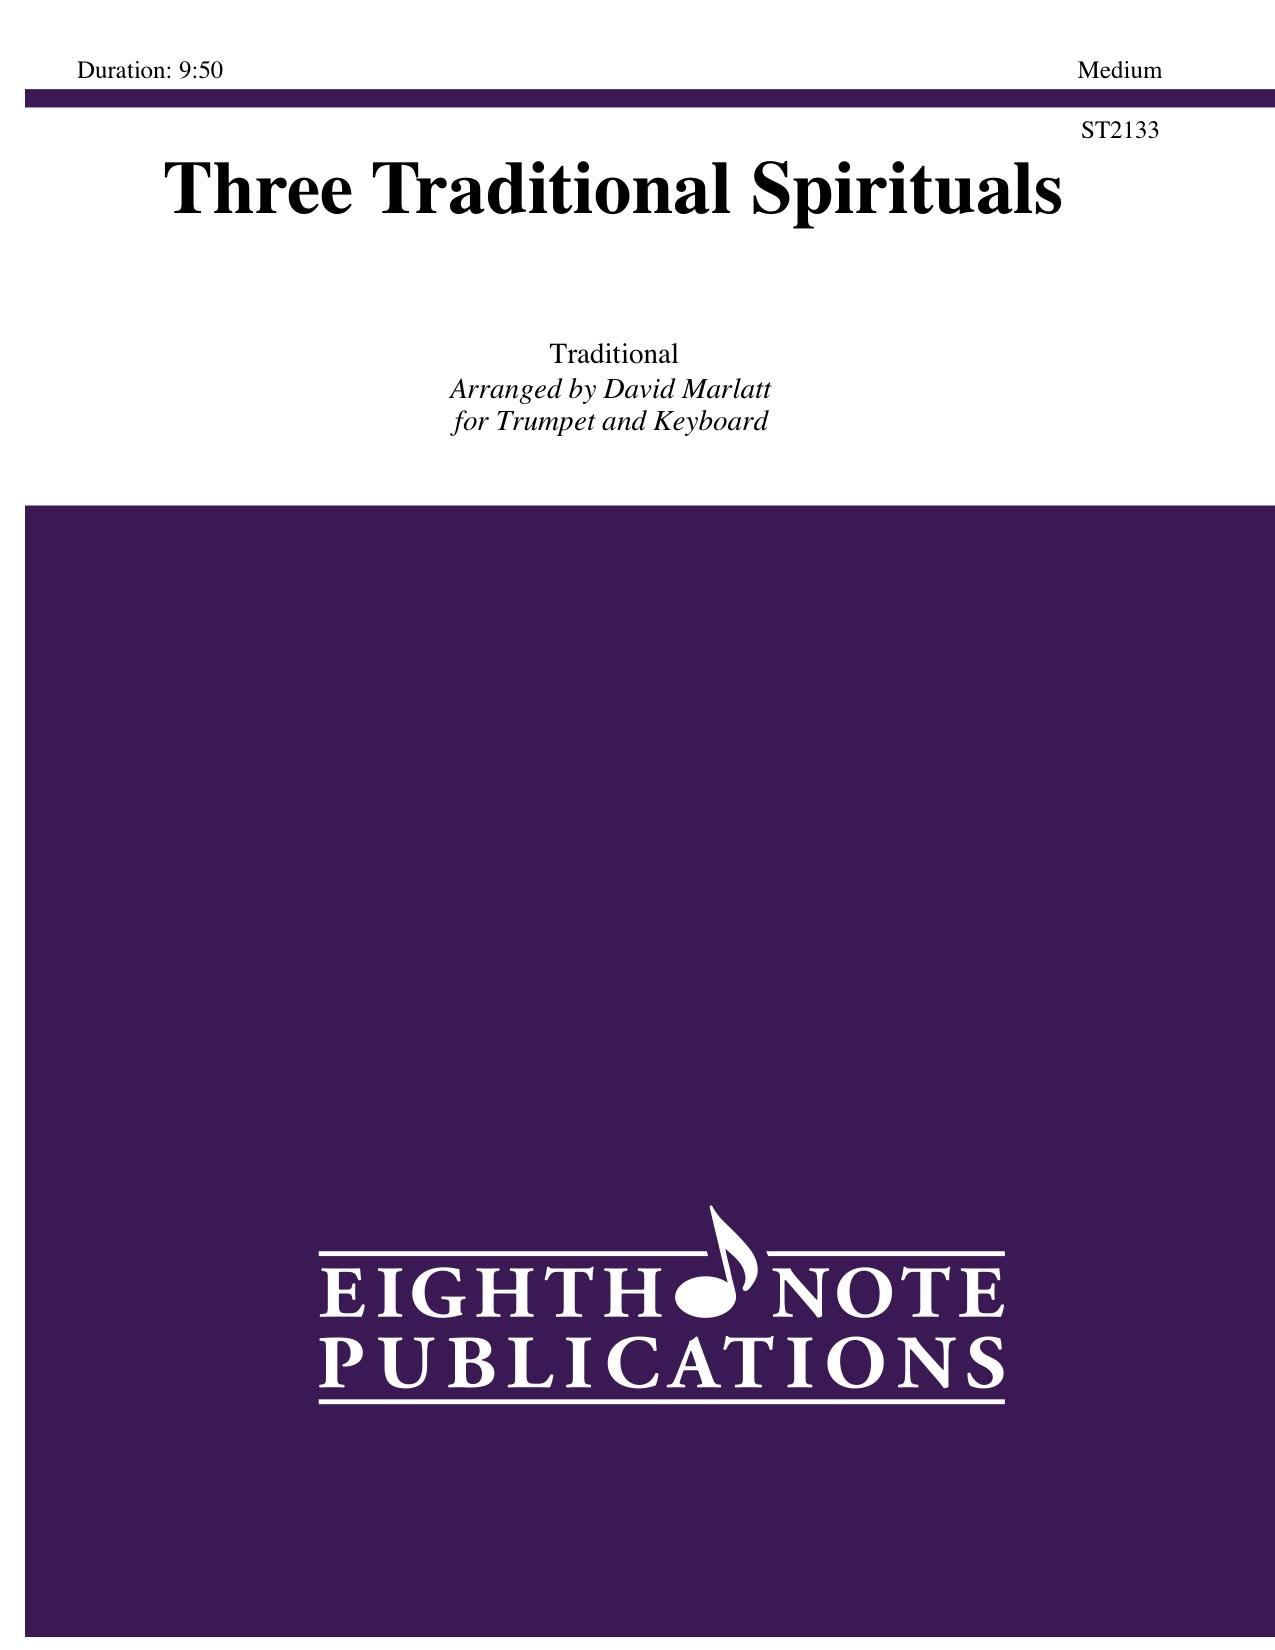 Three Traditional Spirituals  -  Traditional